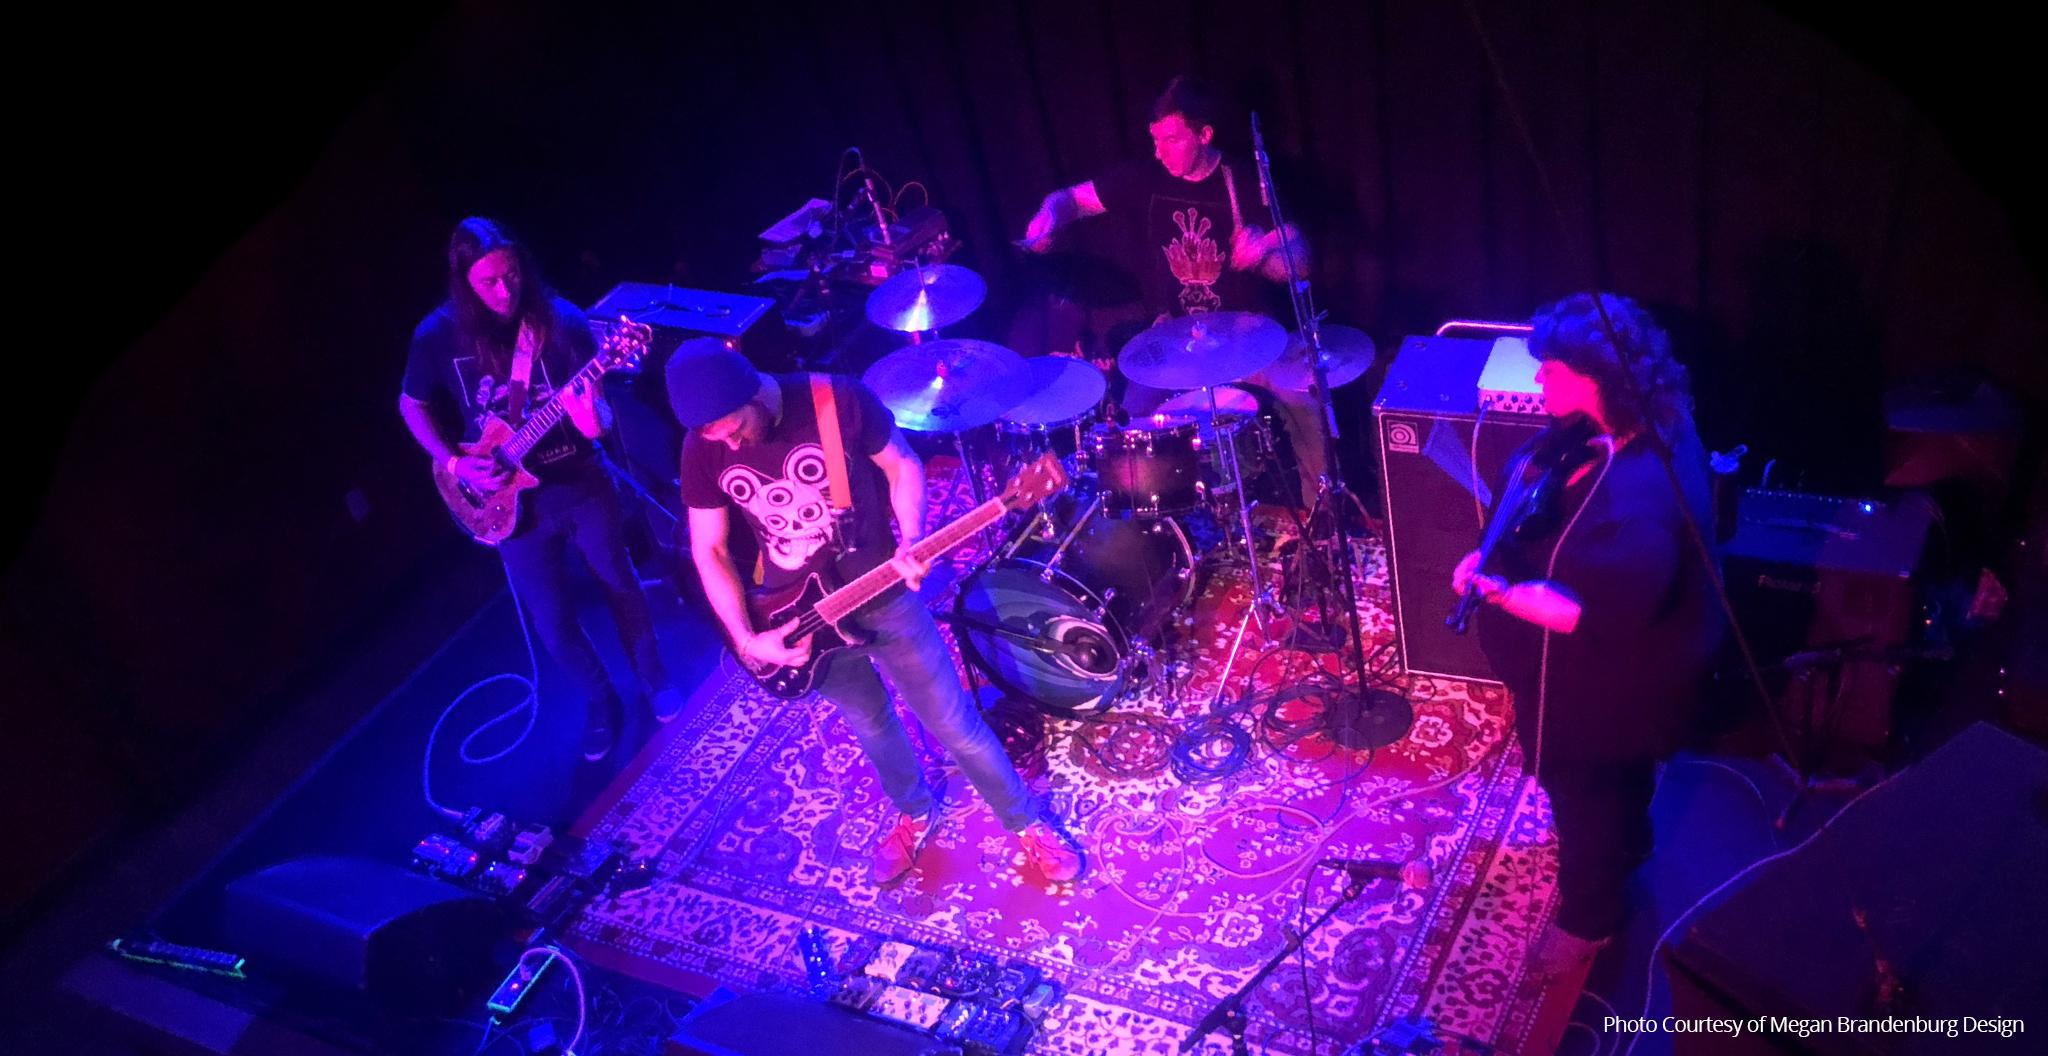 Gazelle(s) Band Live Performance